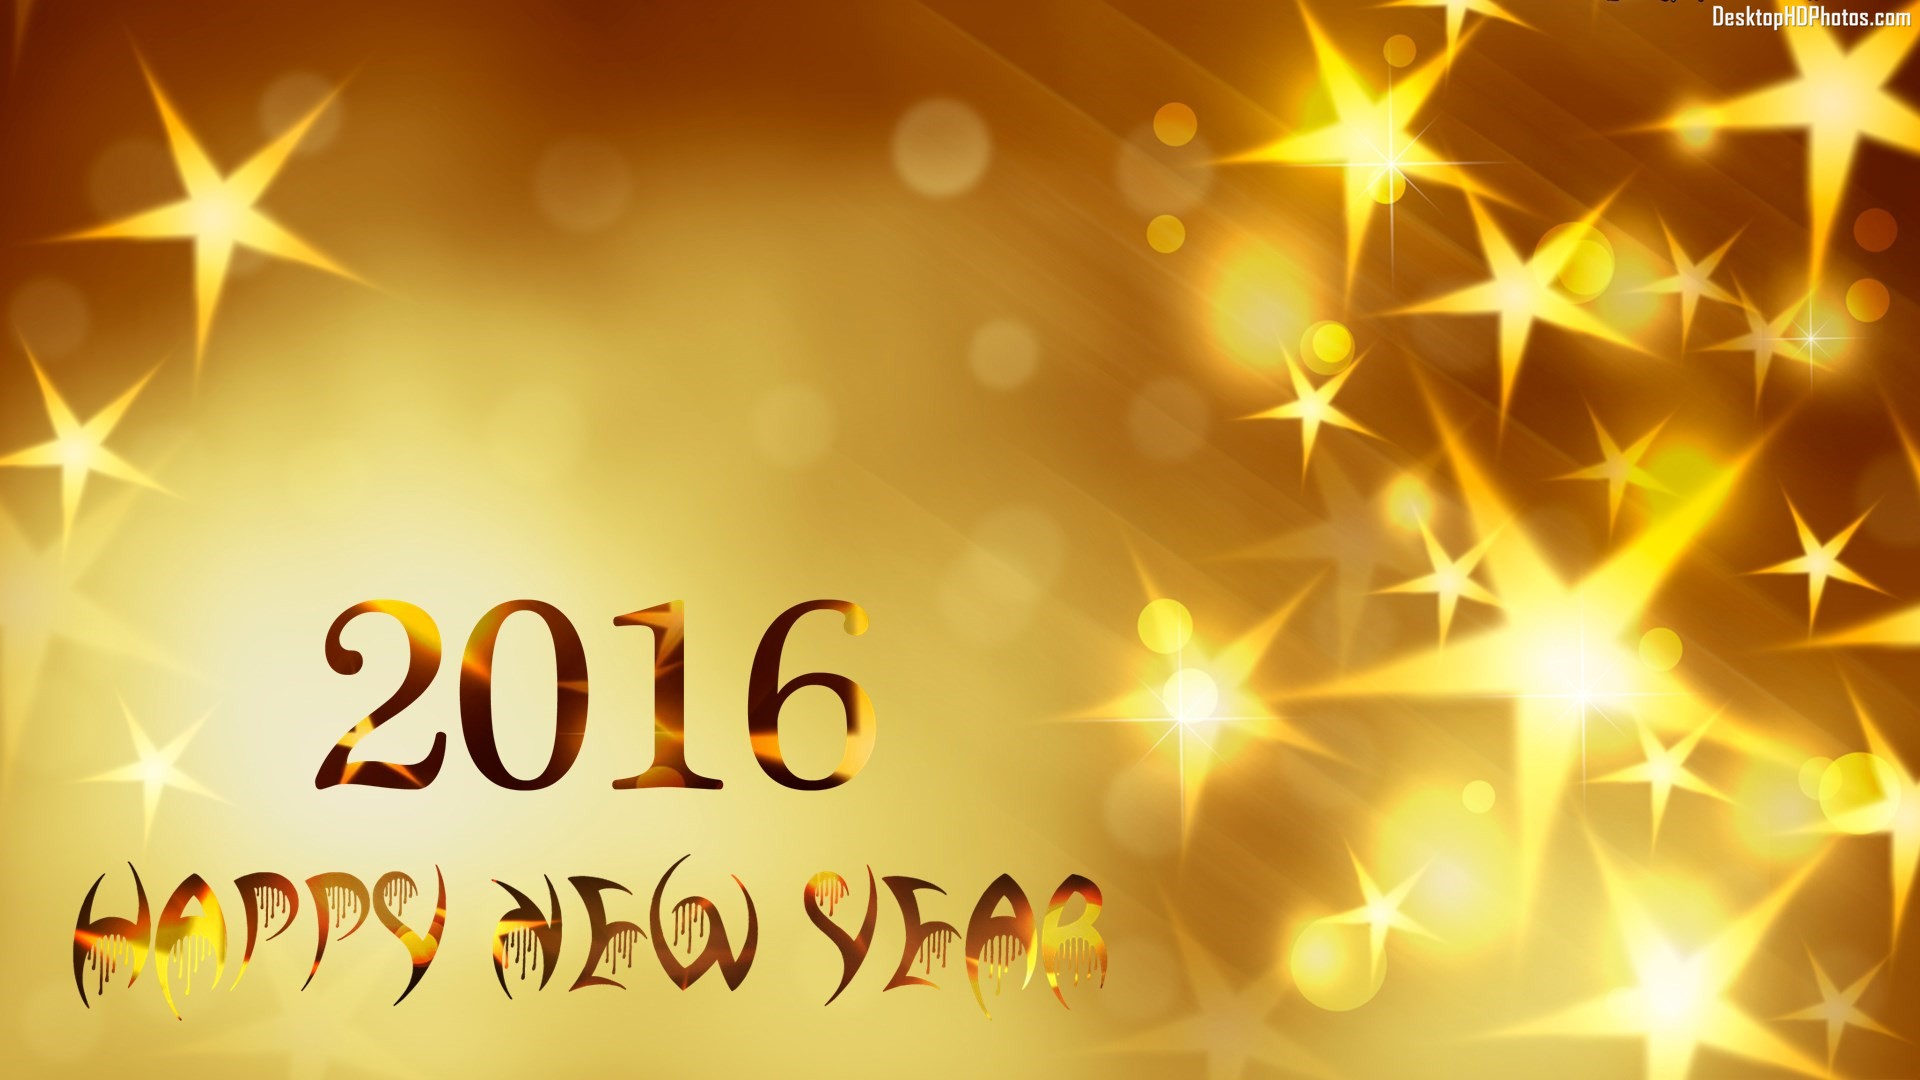 58 Wallpaper Happy New Year 2016 On Wallpapersafari